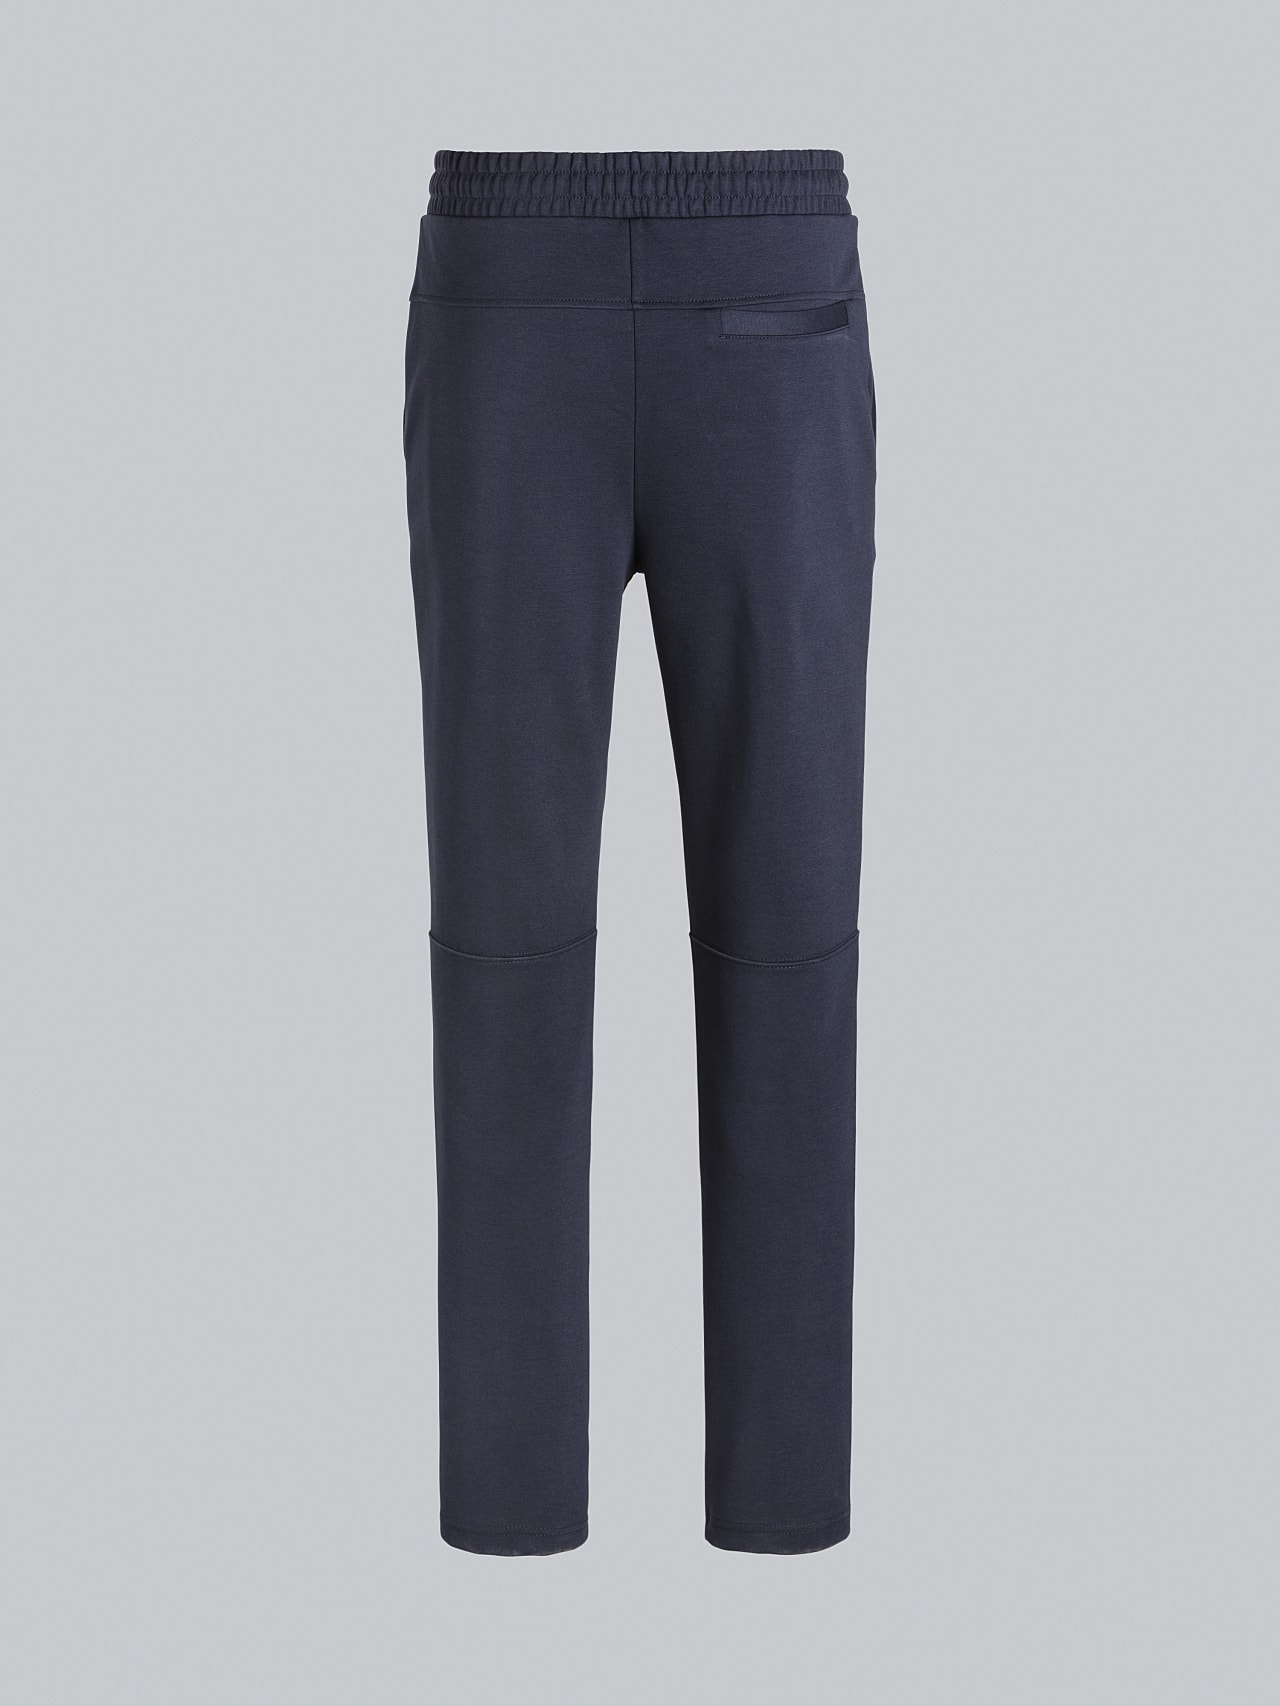 PRYK V7.Y5.02 Premium Sweatpants navy Left Alpha Tauri